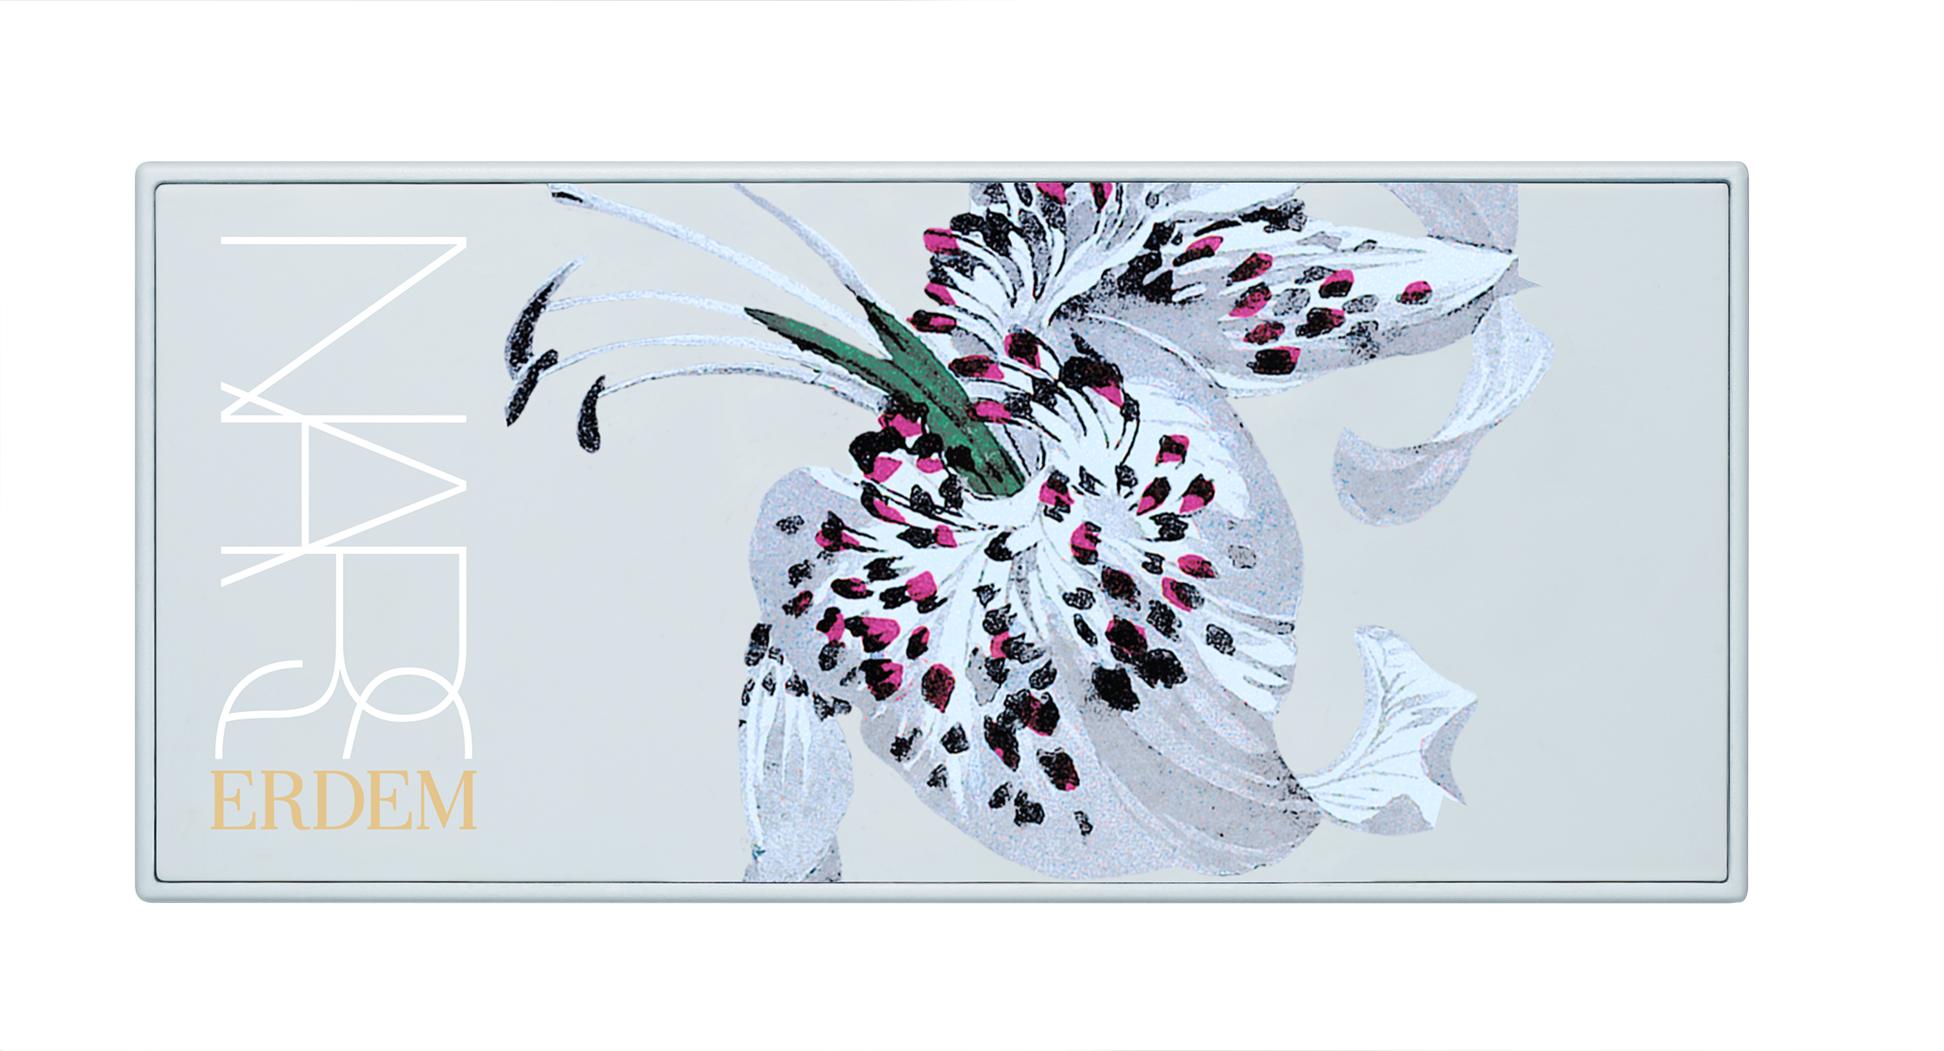 Erdem for NARS Strange Flowers Collection - Night Garden Eyeshadow Palette Closed.jpg